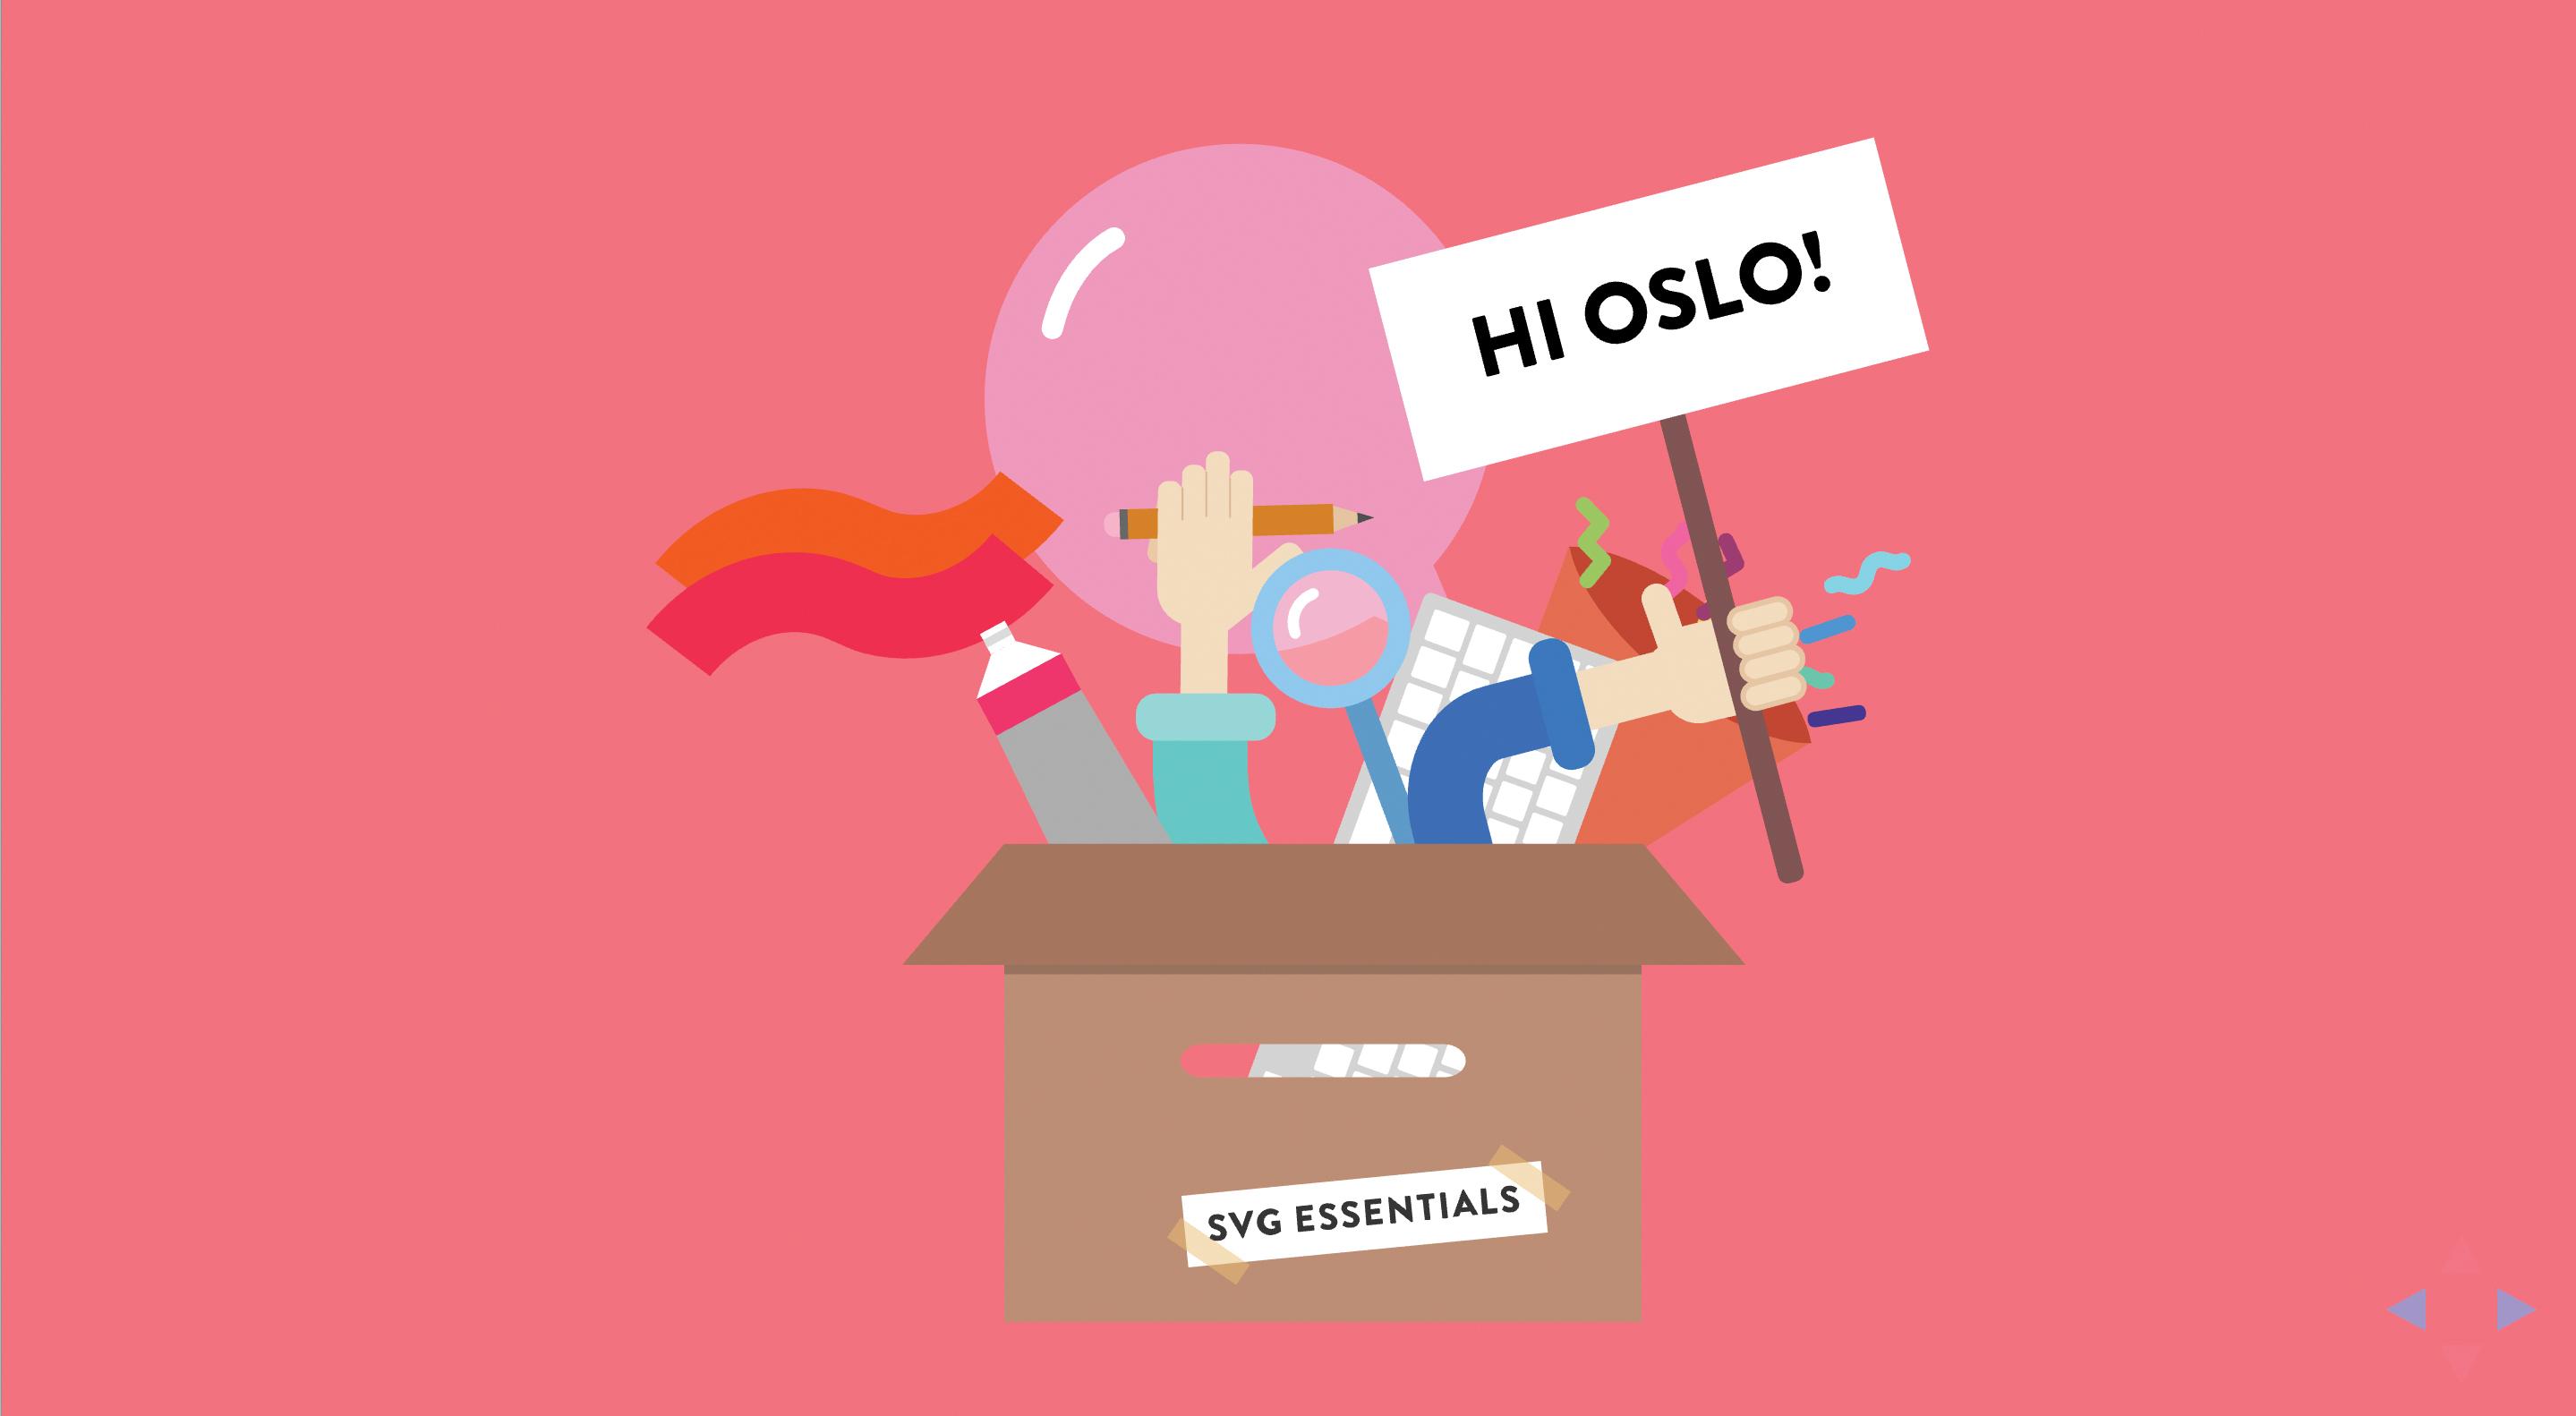 CSS tricks: CSSconf Nordic